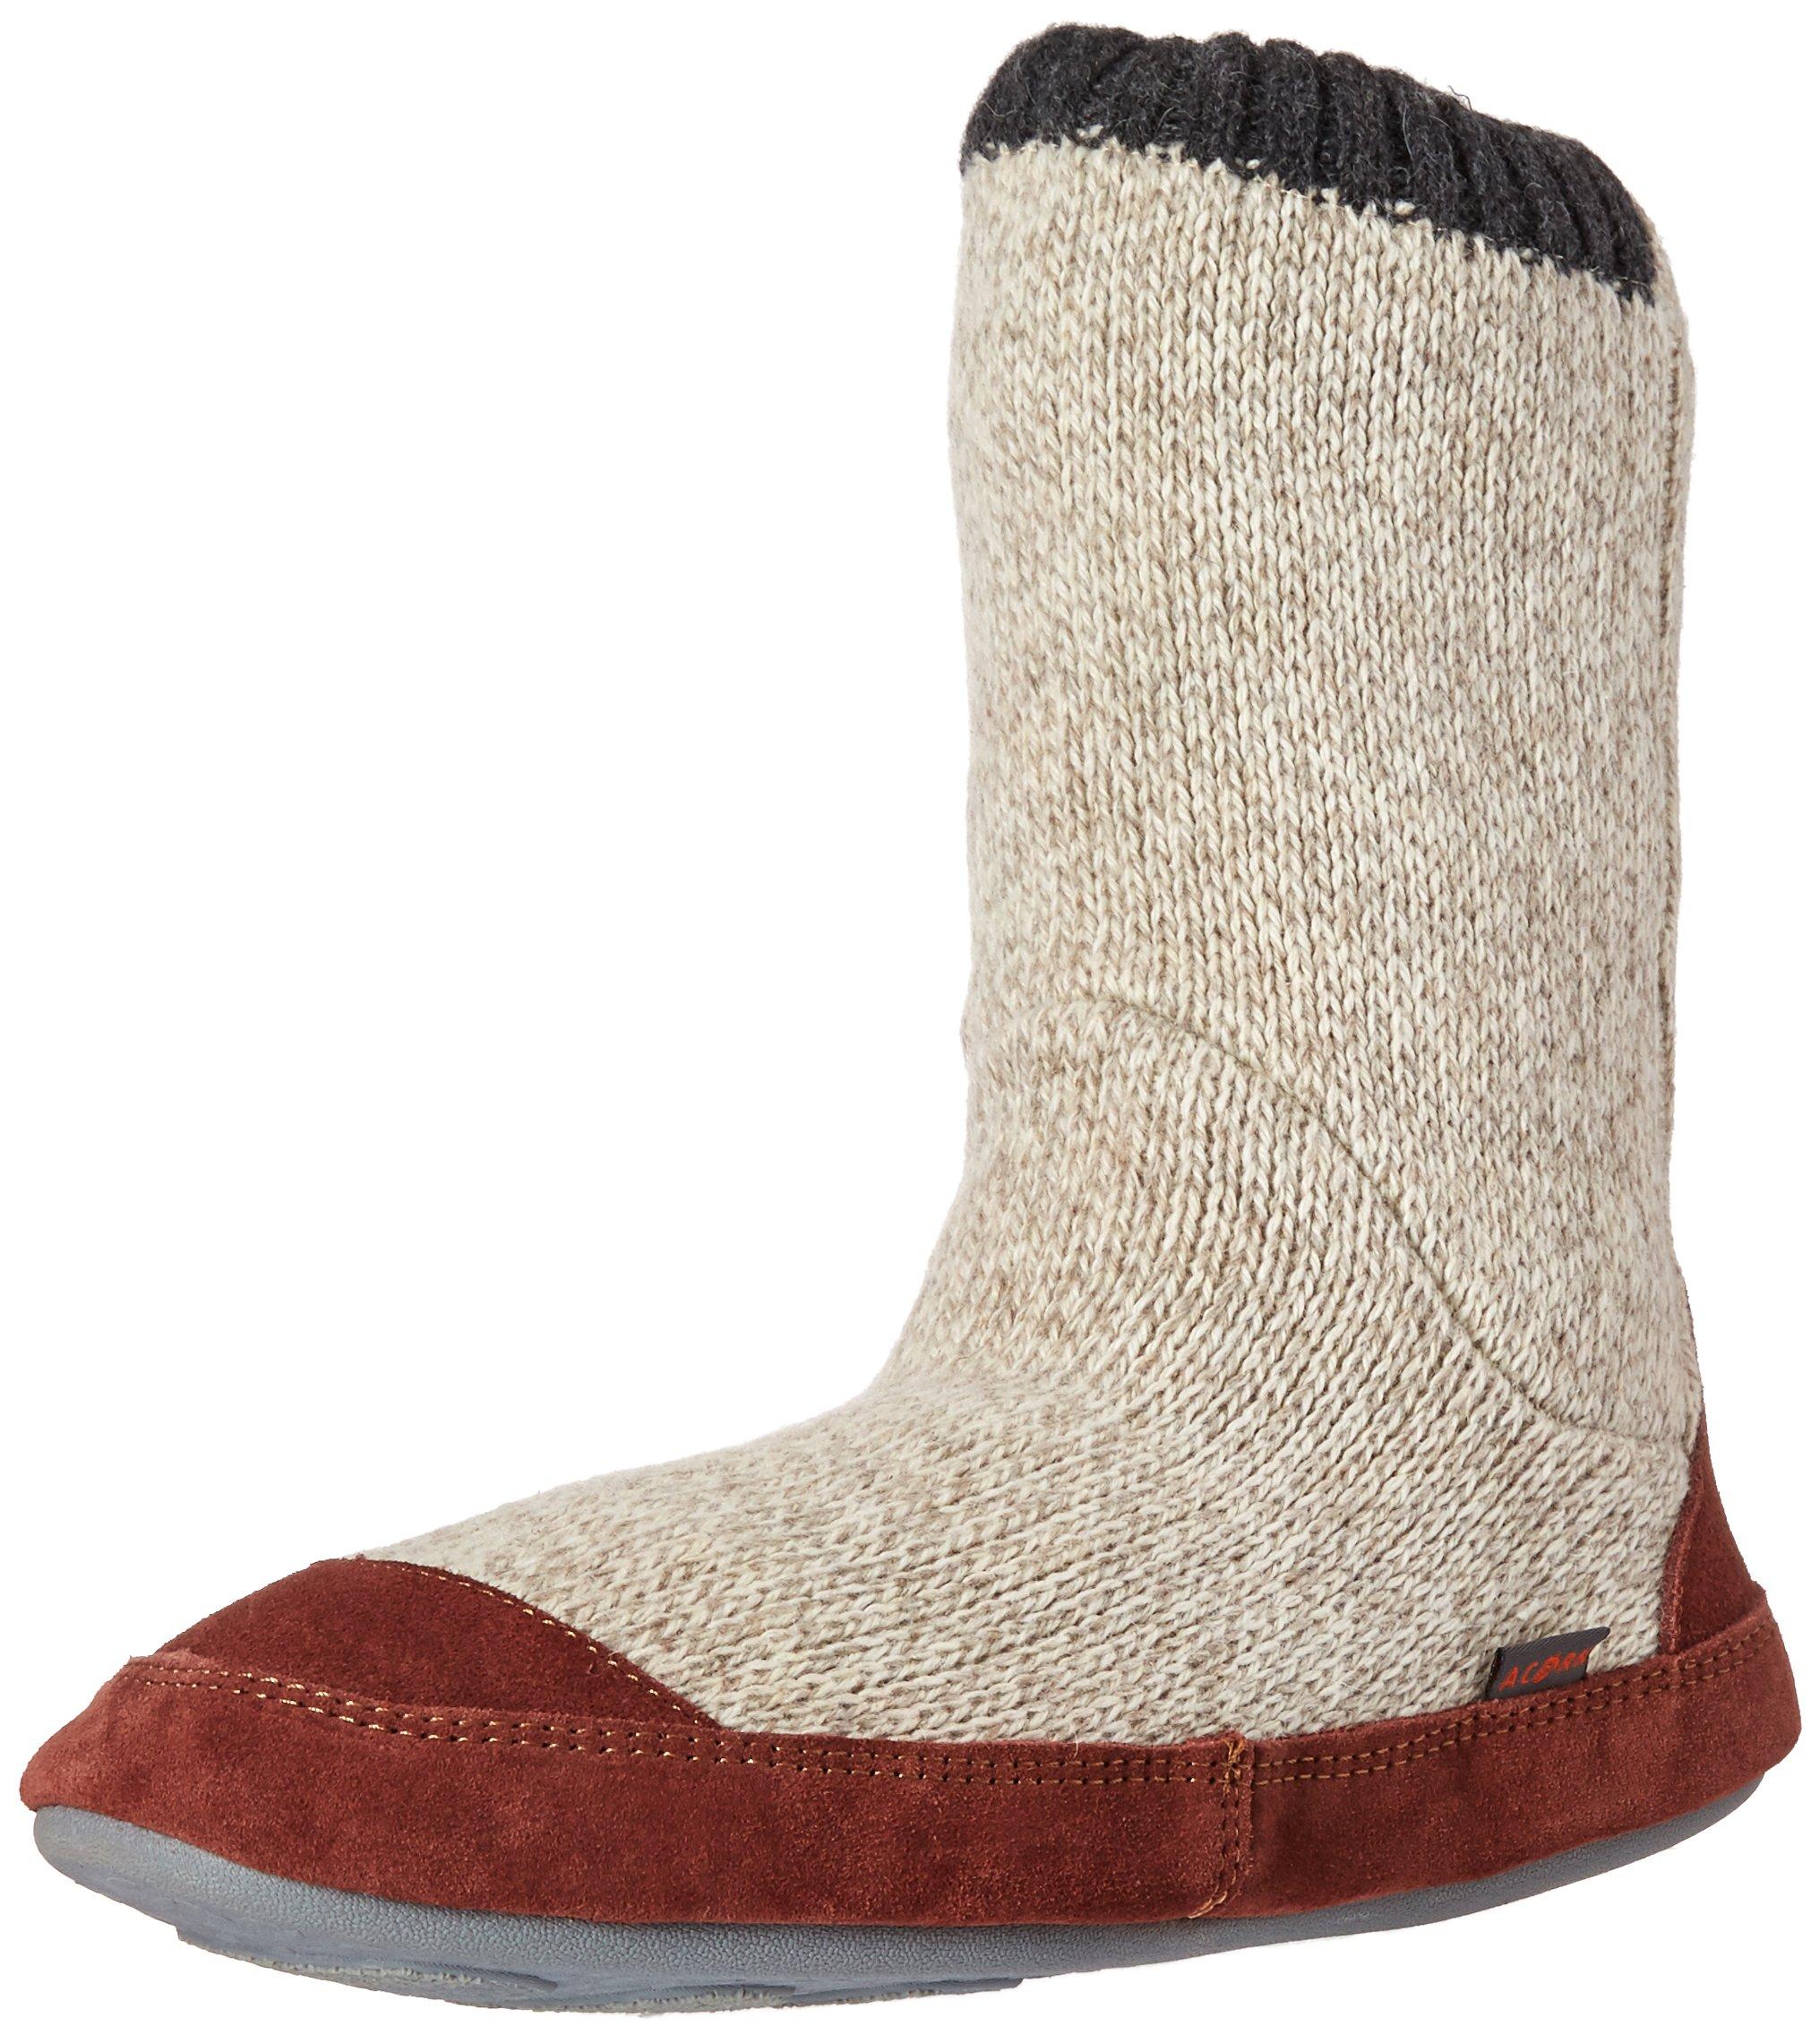 Acorn Men's Slouch Boot Slipper, Grey Ragg Wool, Large / 10.5-11.5 by Acorn